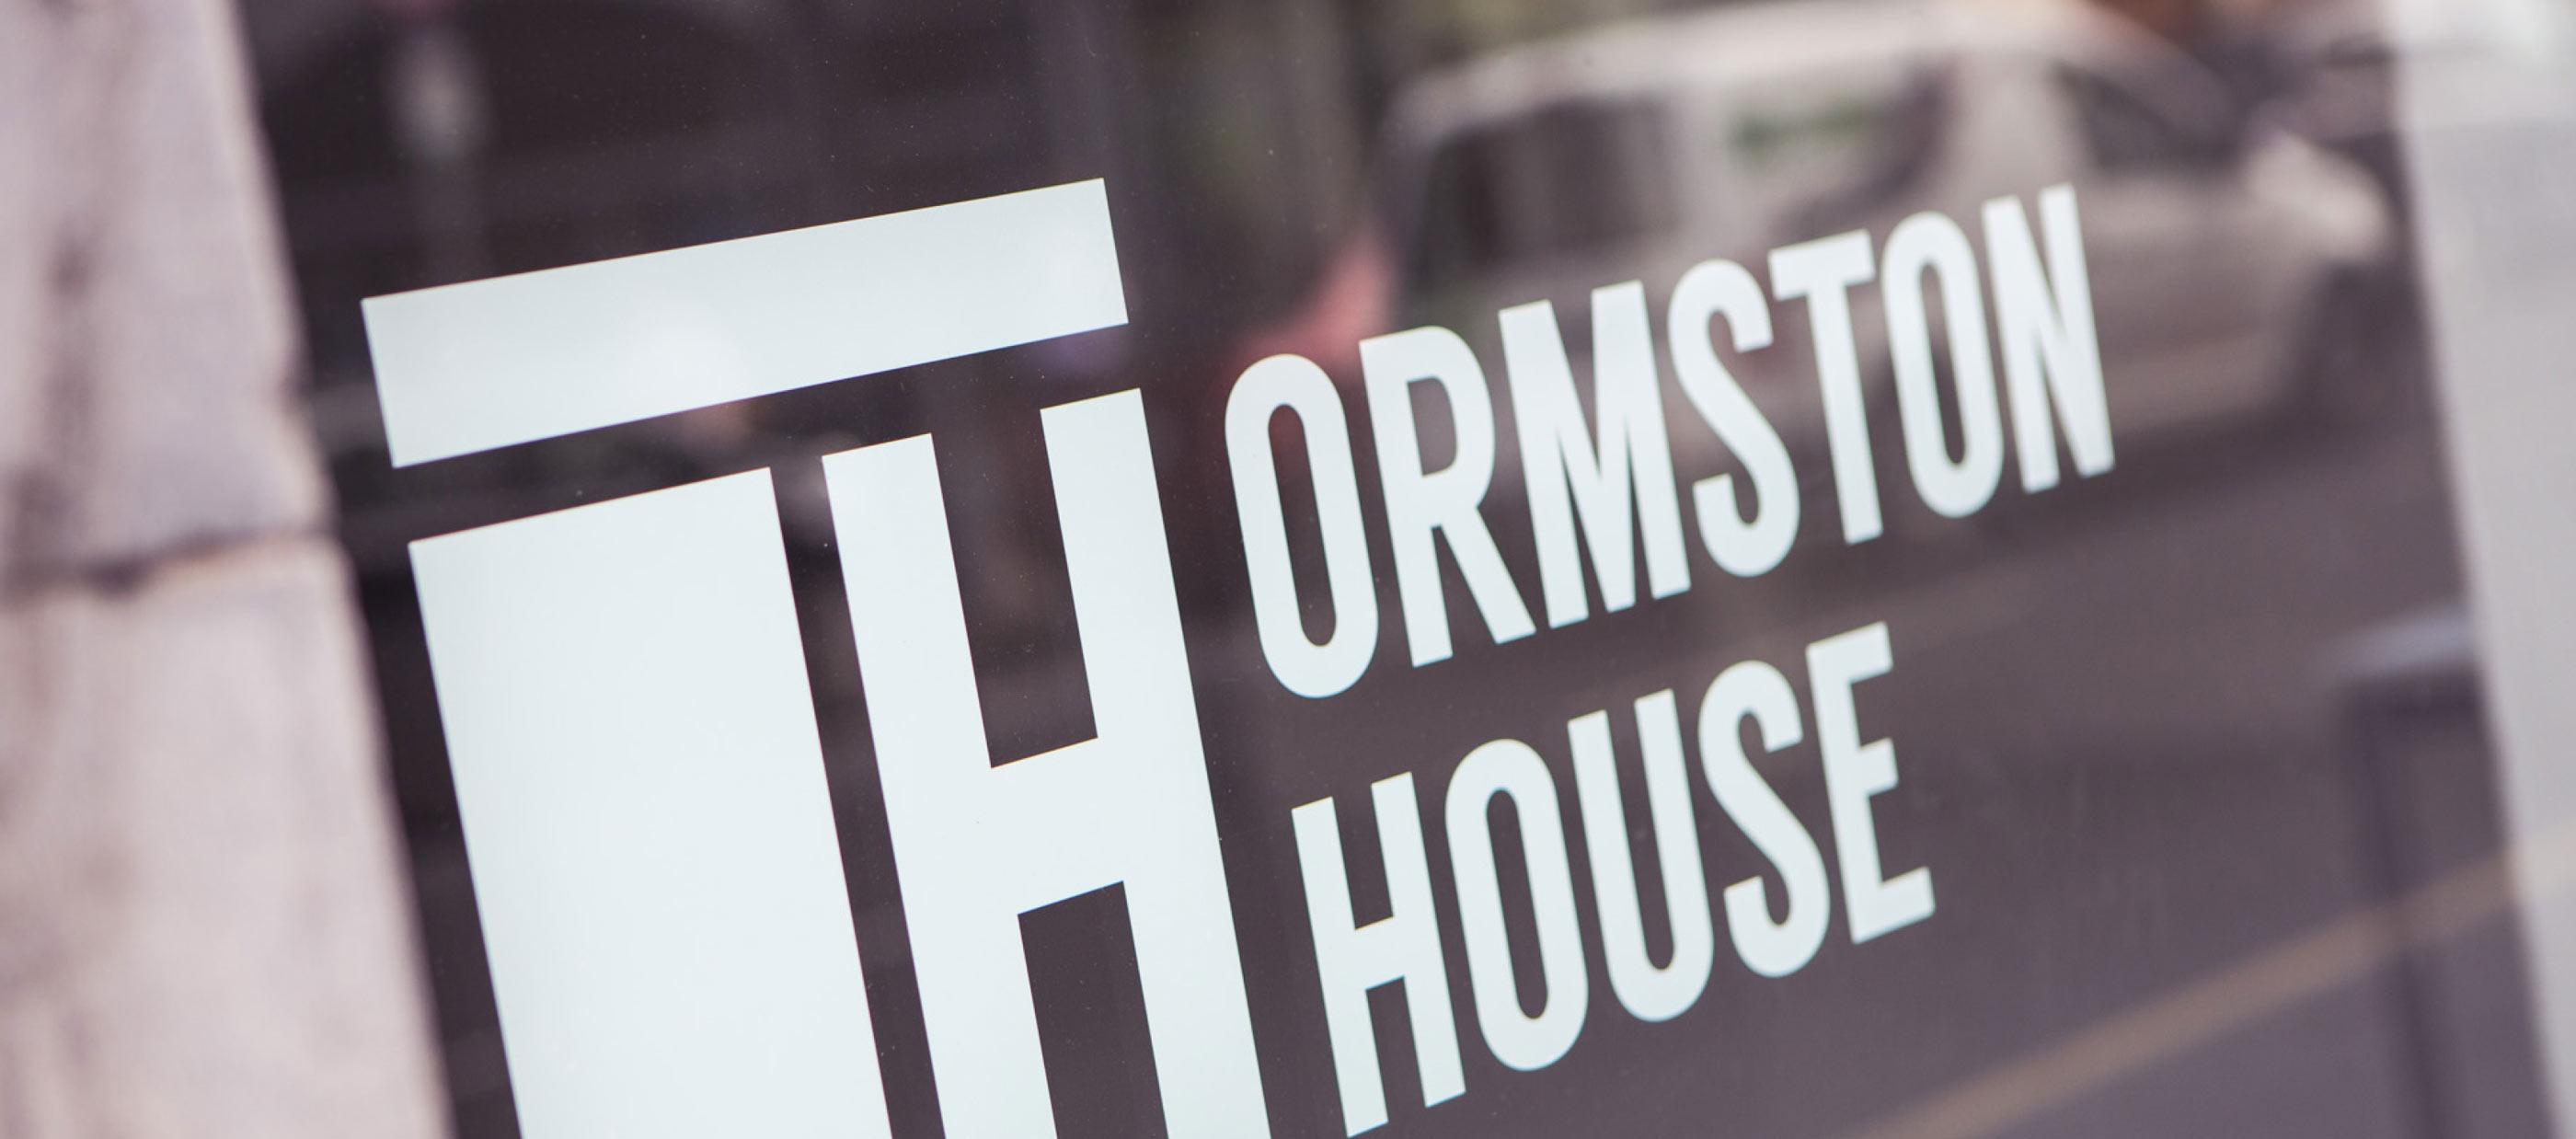 Ormston House Limerick brand development and logo design image of window